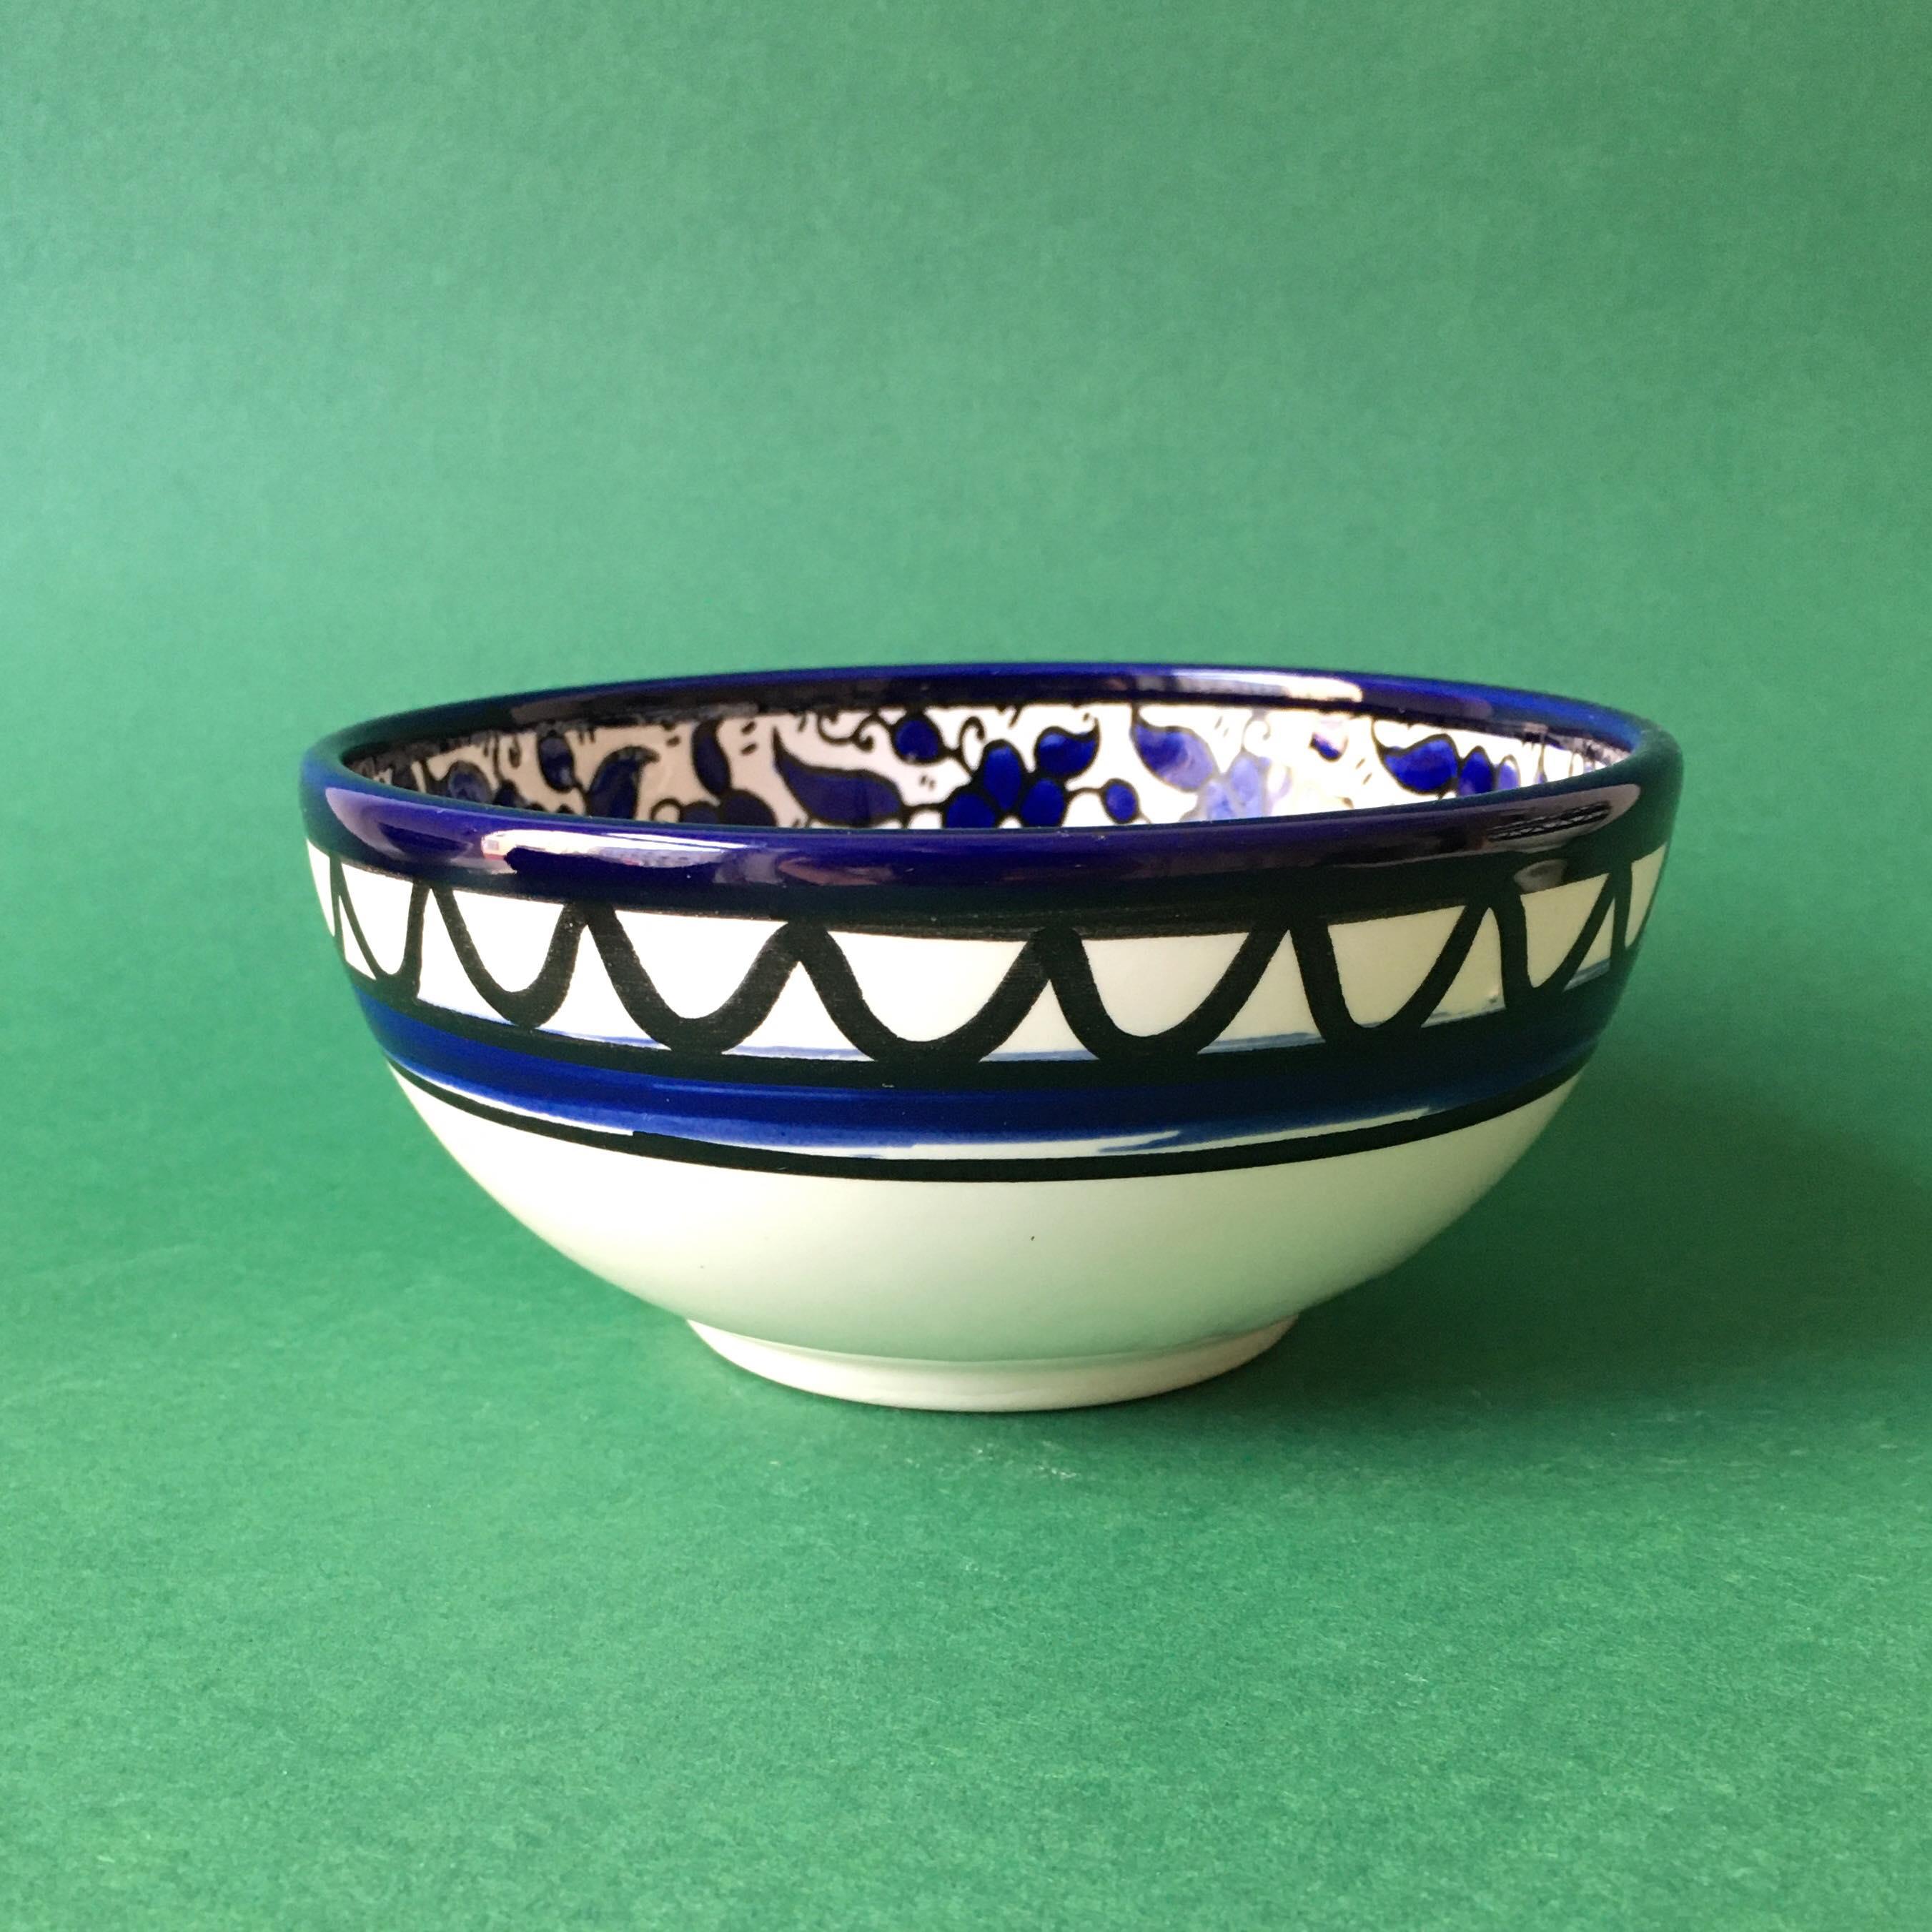 Keramikkskål, blå